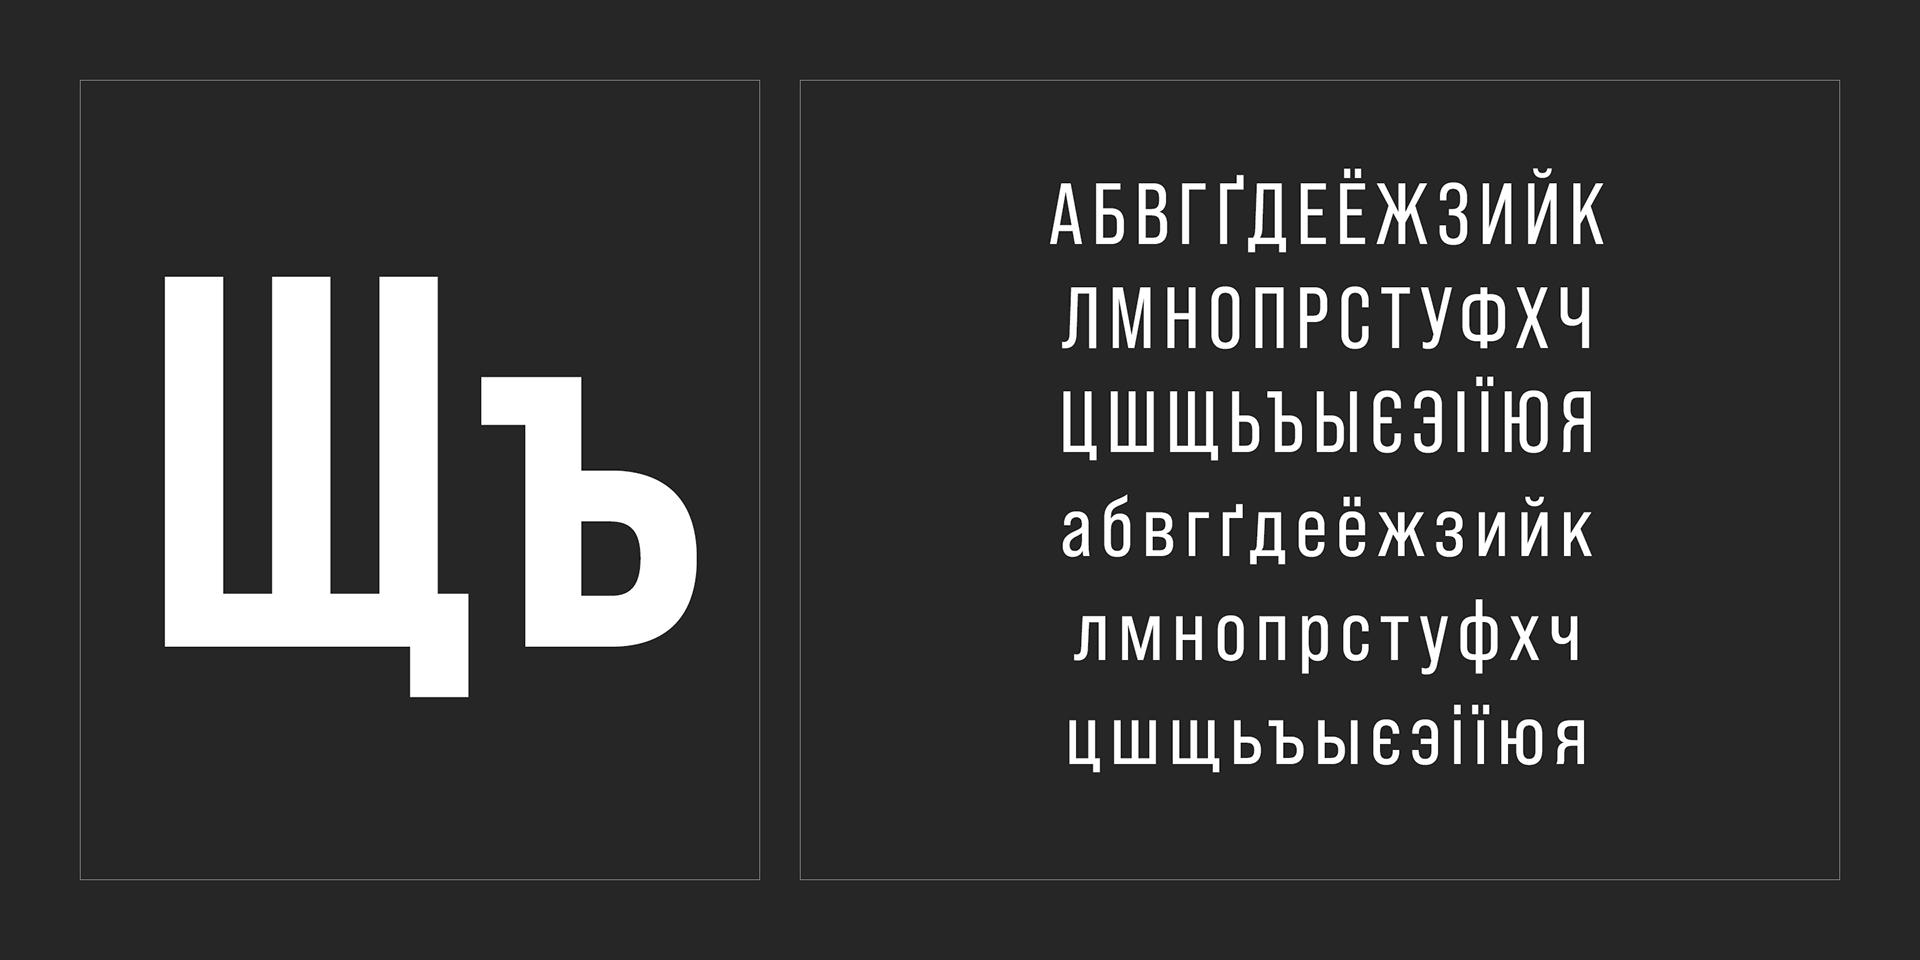 Bebas Neue Pro - Lowercase & Italic! 3 widths & 40 styles!